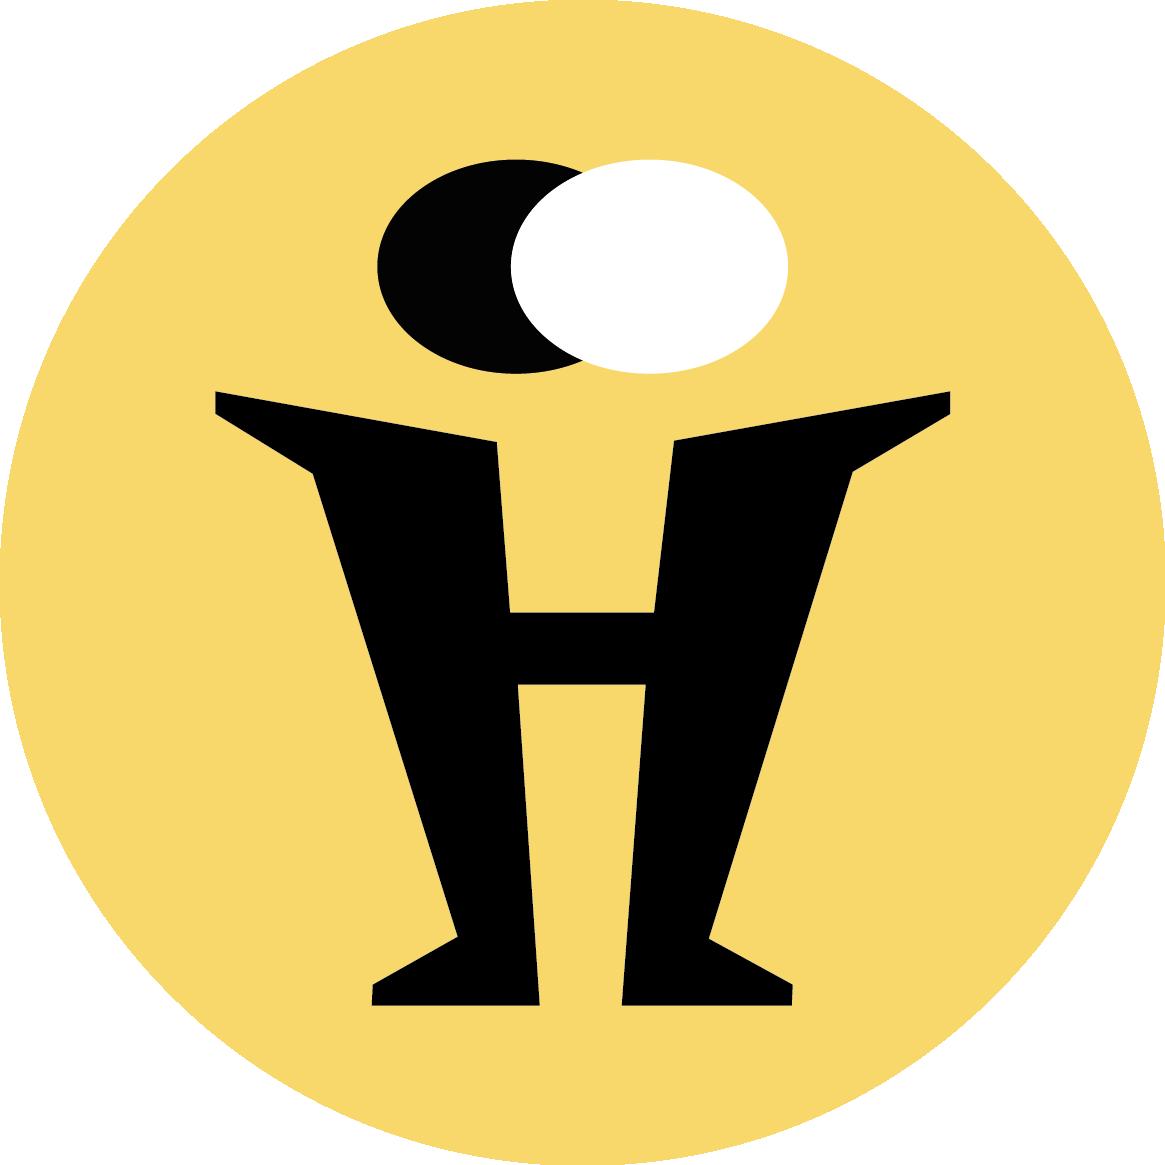 Grundschule Hilpoltstein